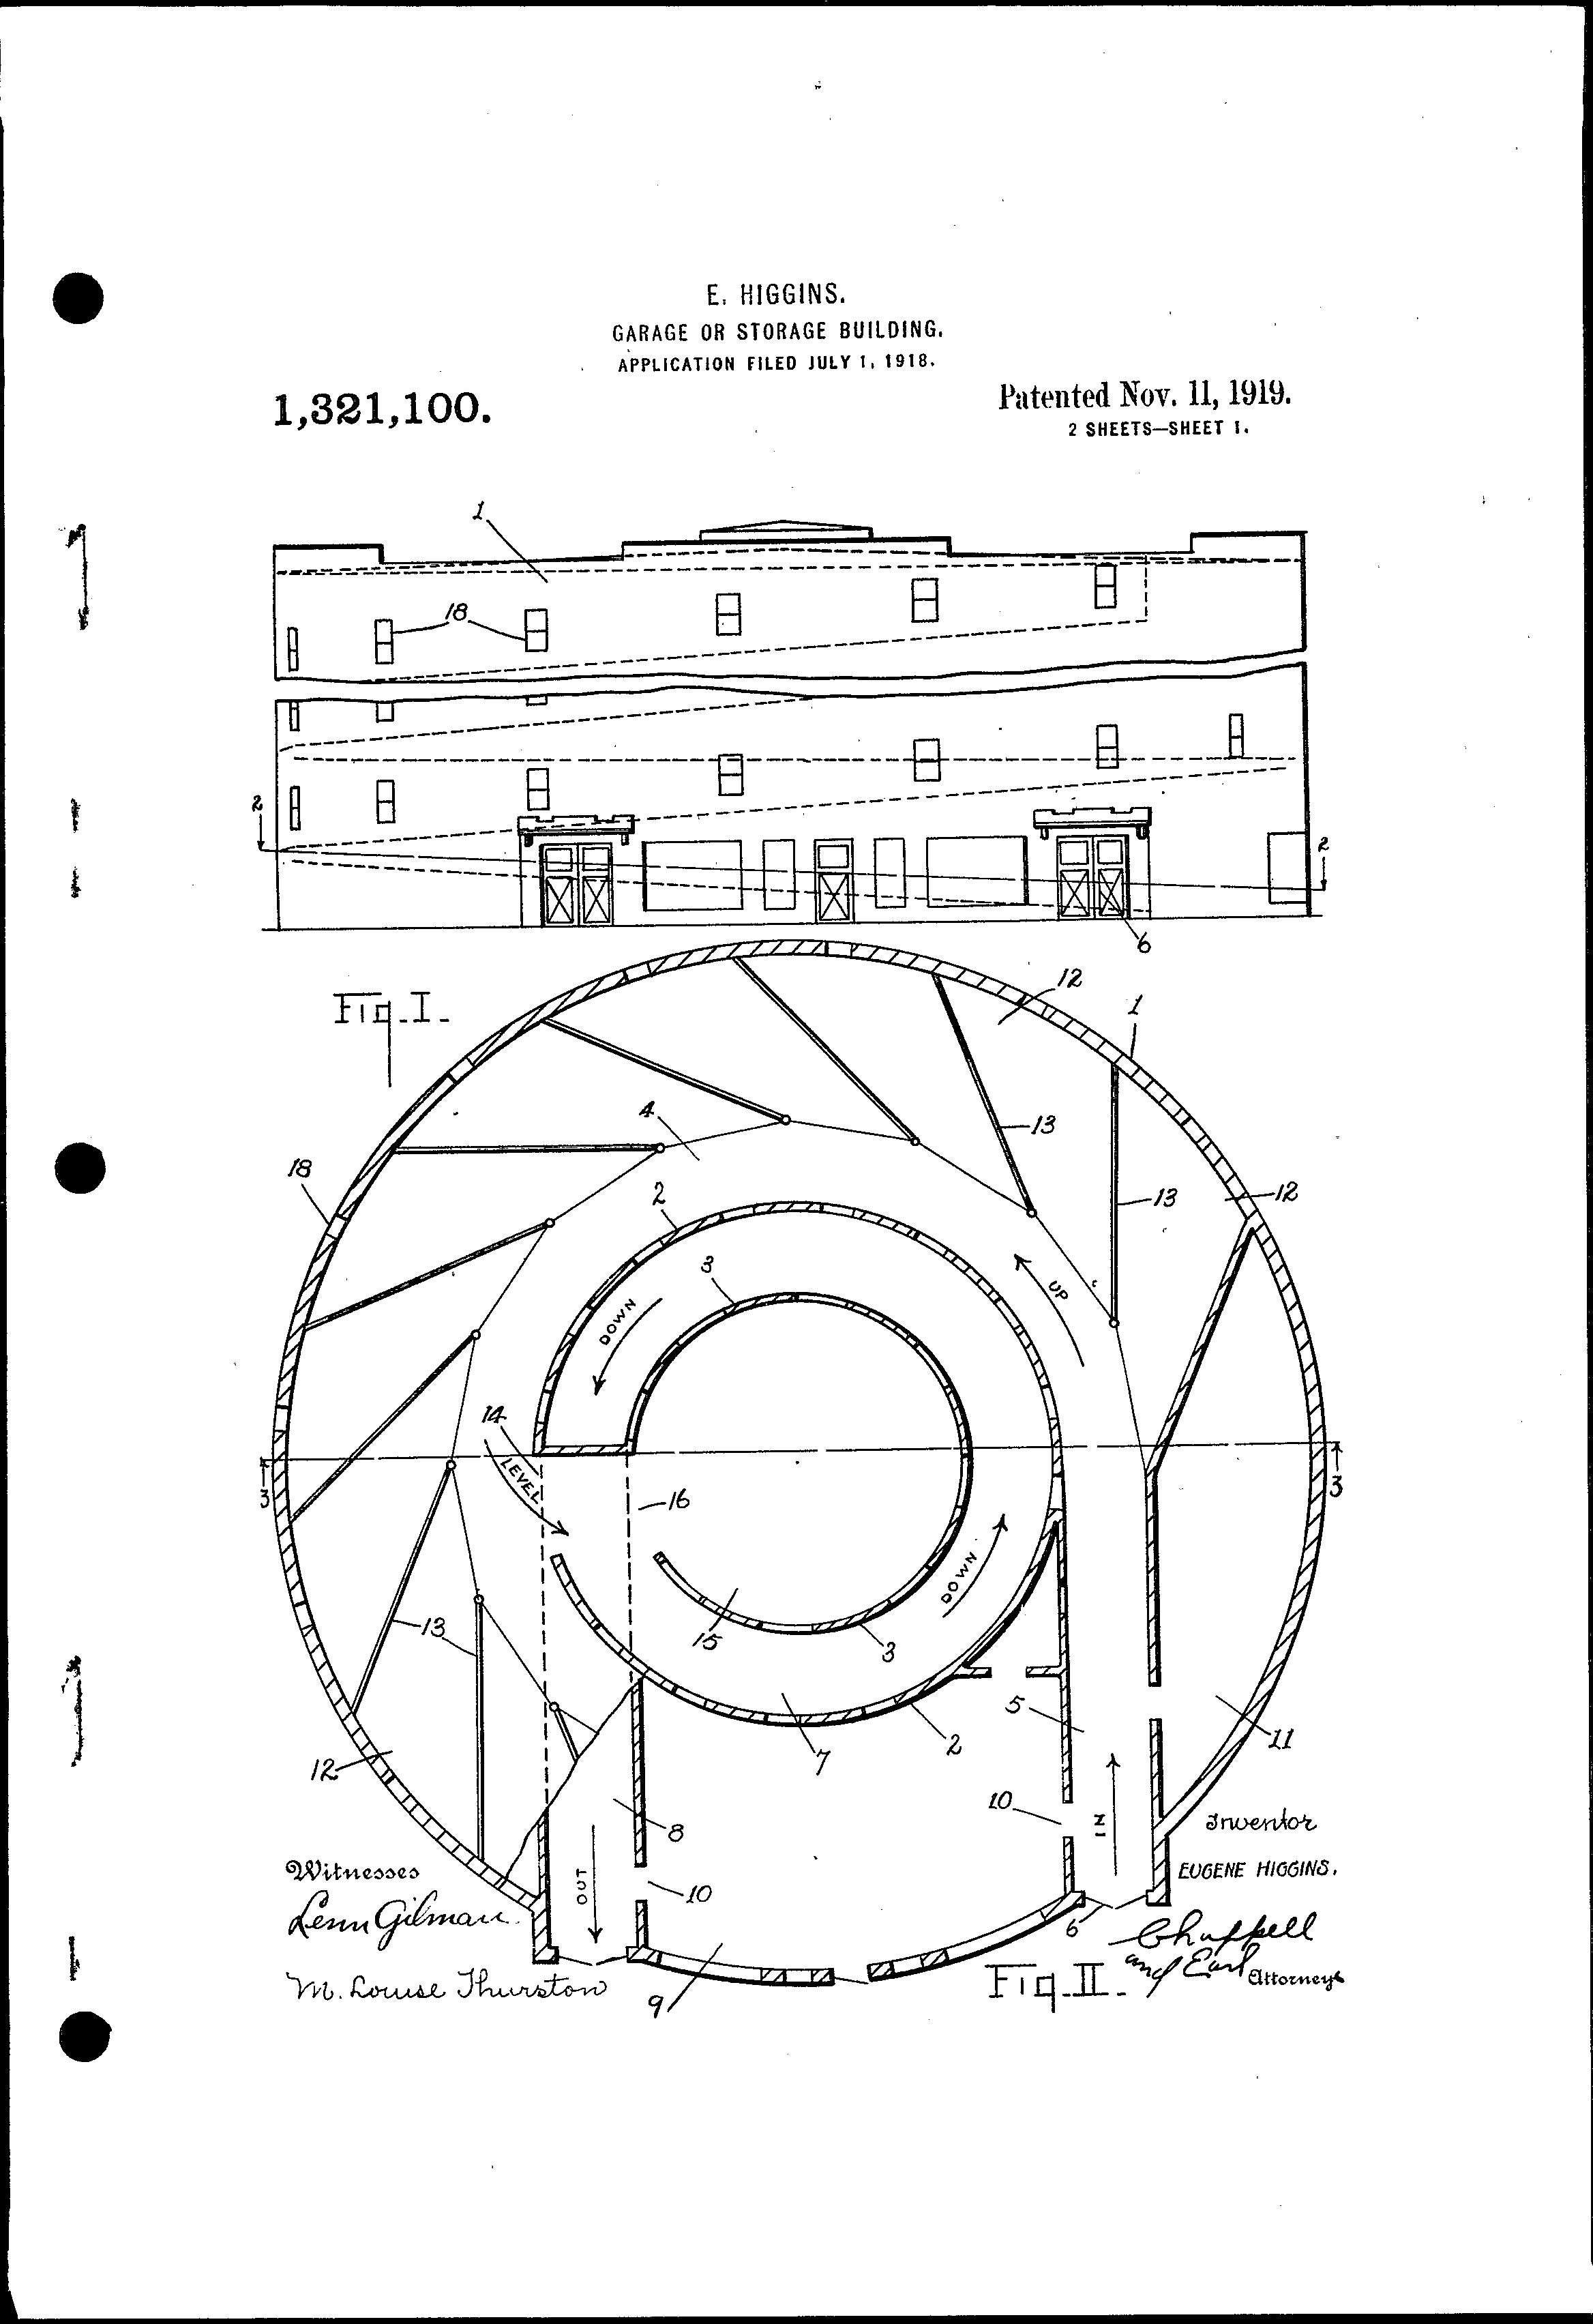 parking structure design